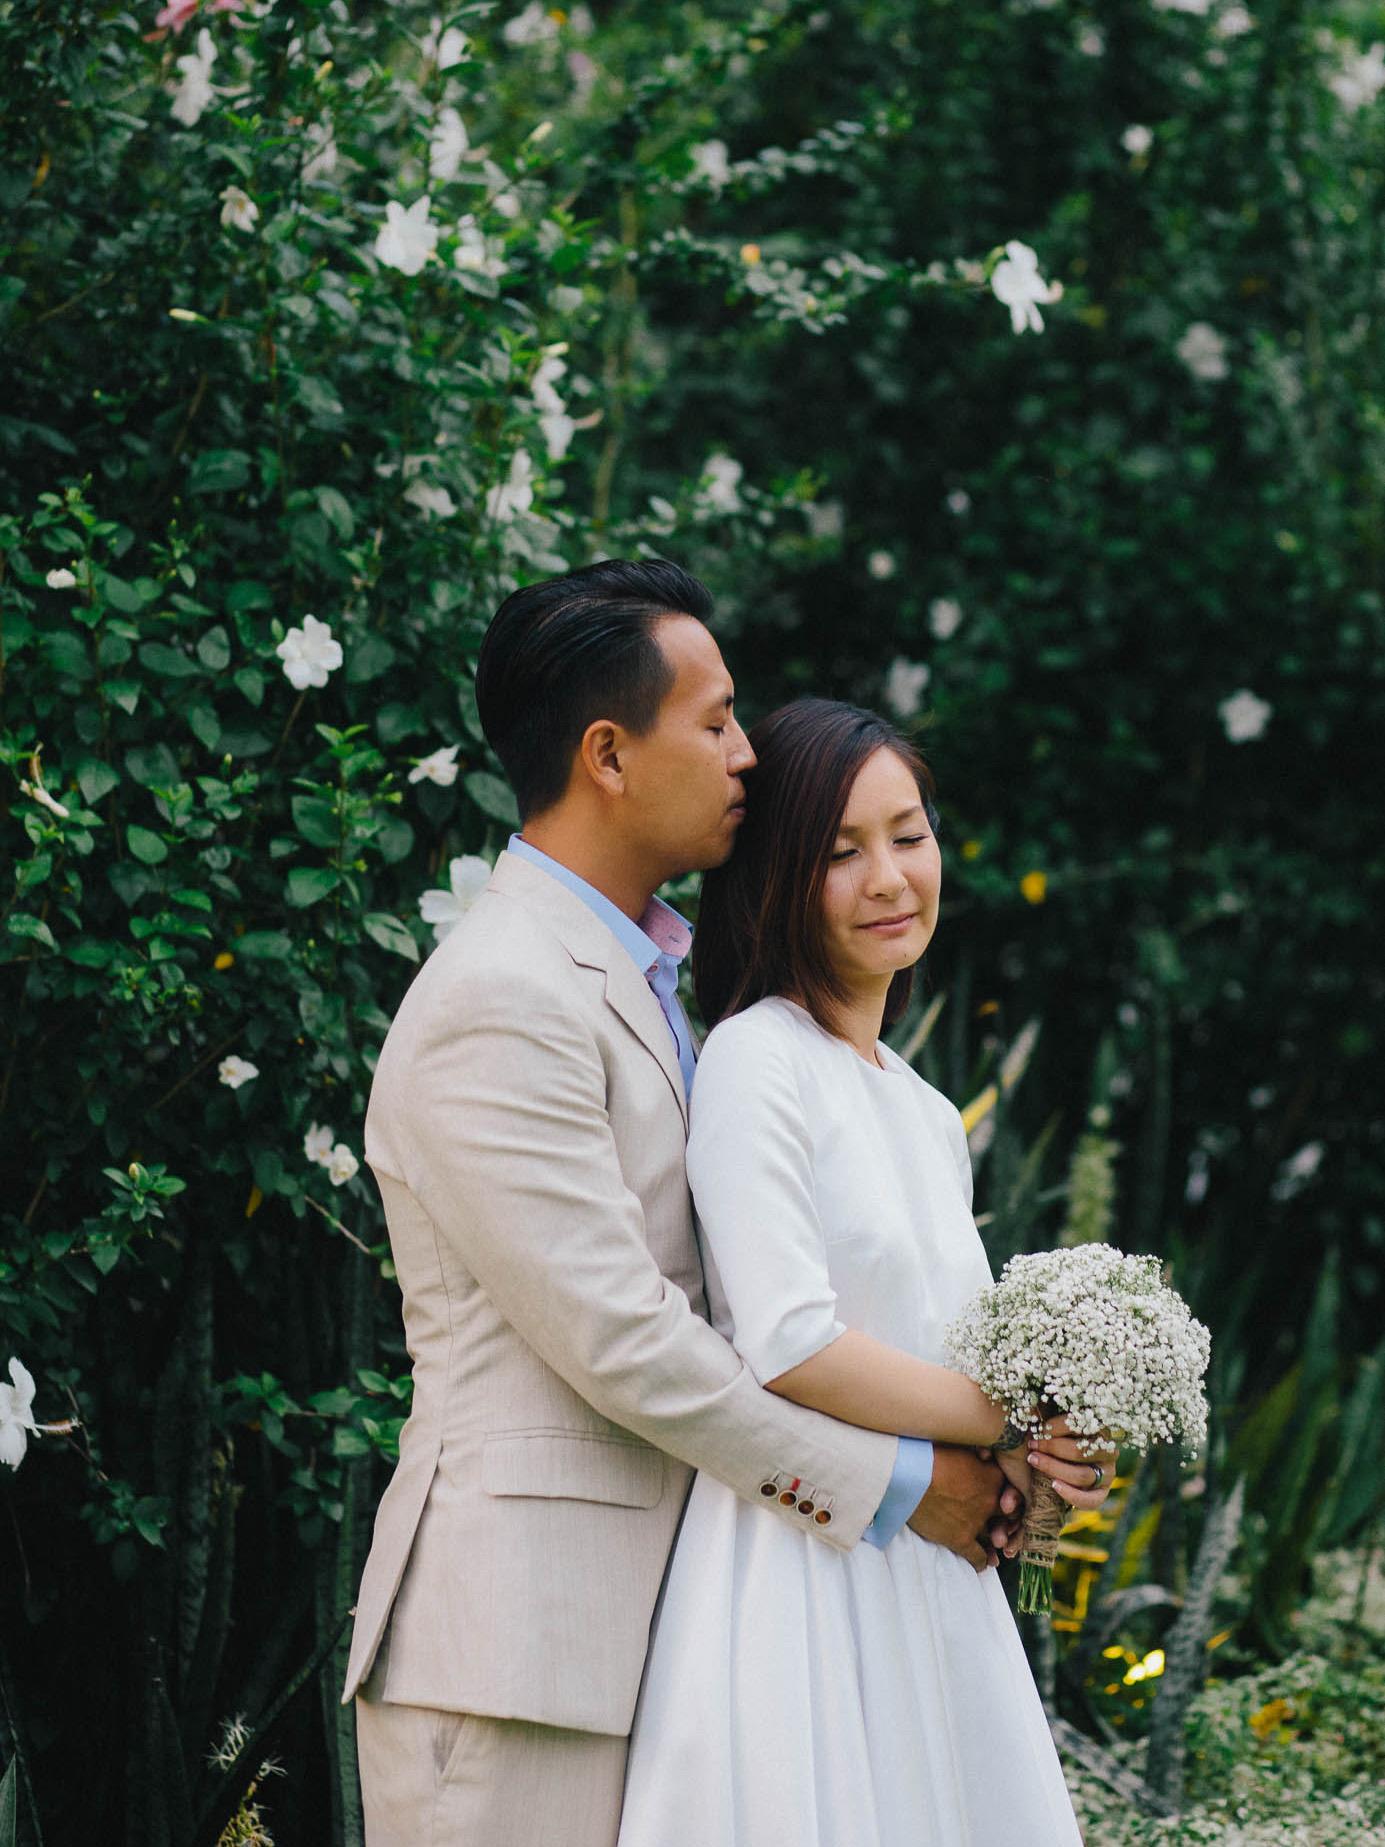 singapore-wedding-photographer-malay-indian-pre-wedding-travel-wmt-2015-84.jpg